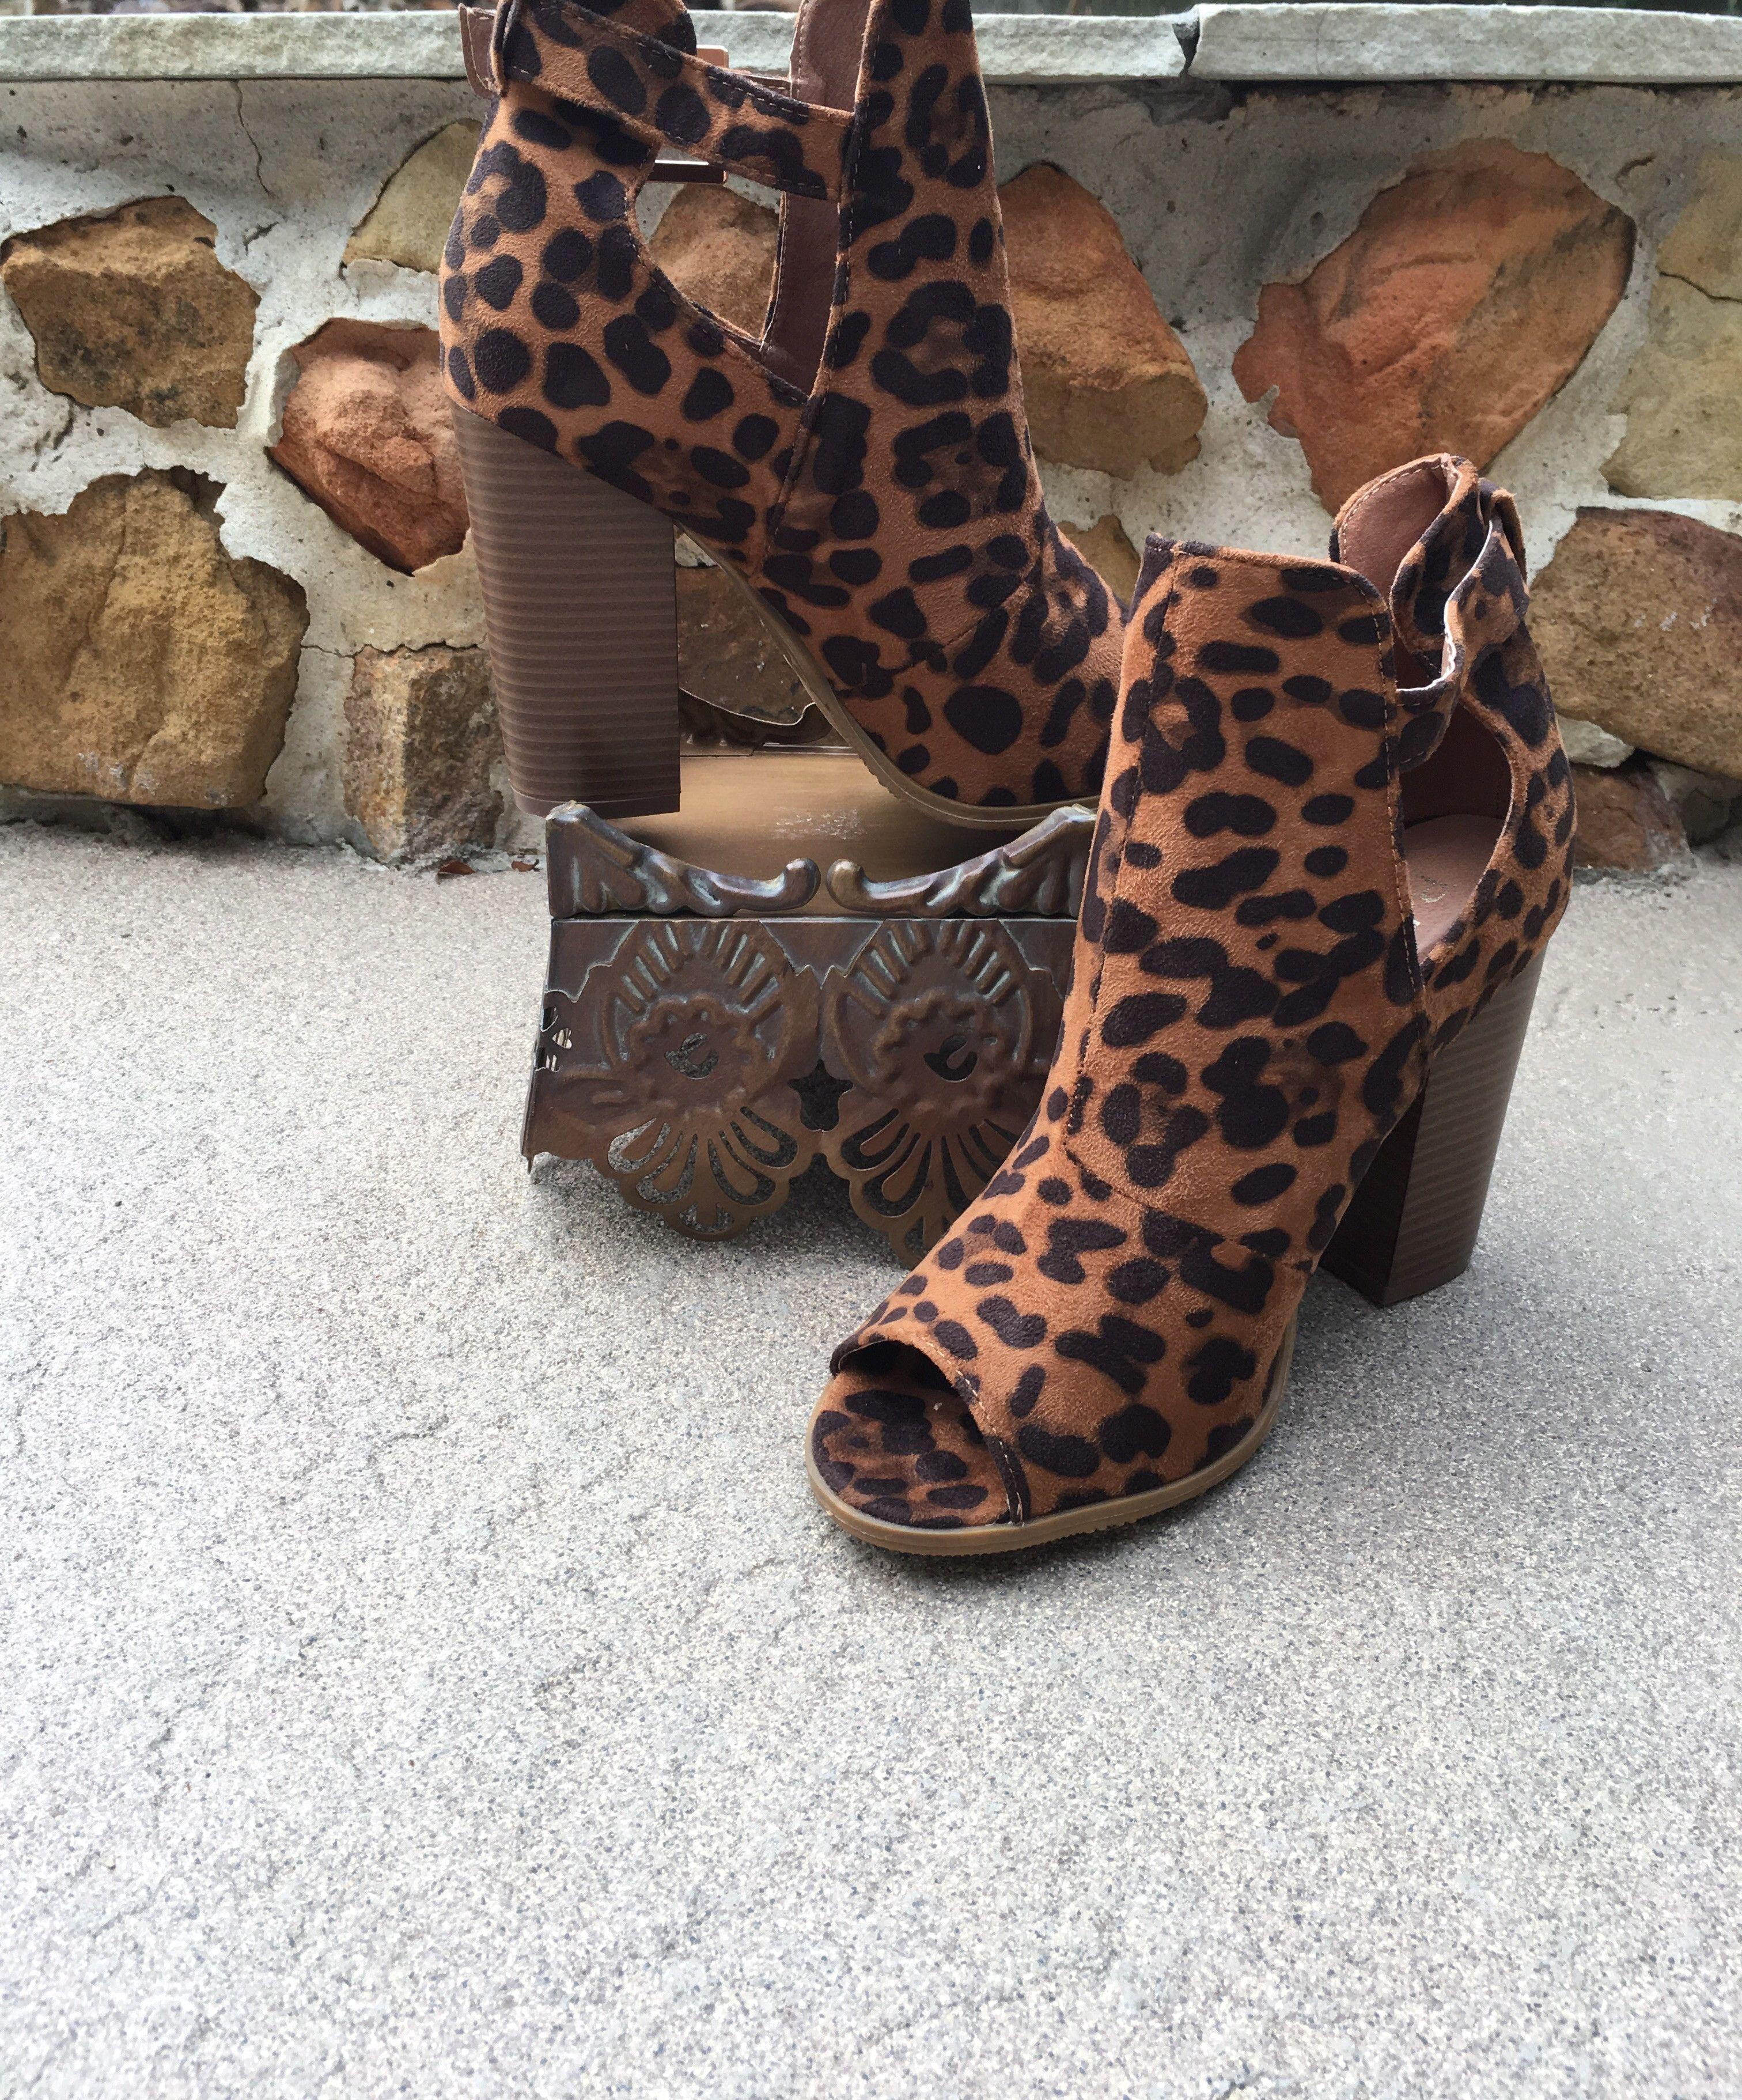 Leopard Peep Toe Booties